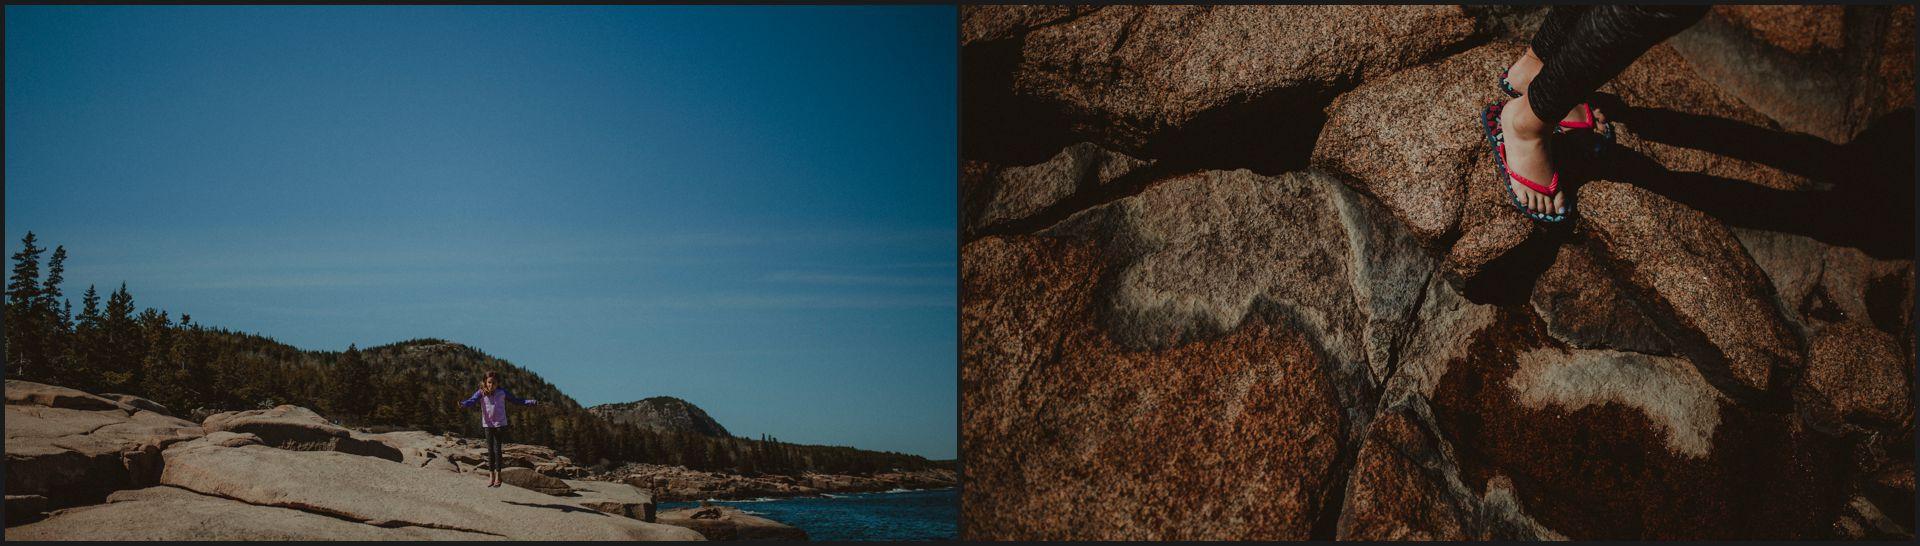 landscape, maine, acadia national park, beach, ocean, cliffs